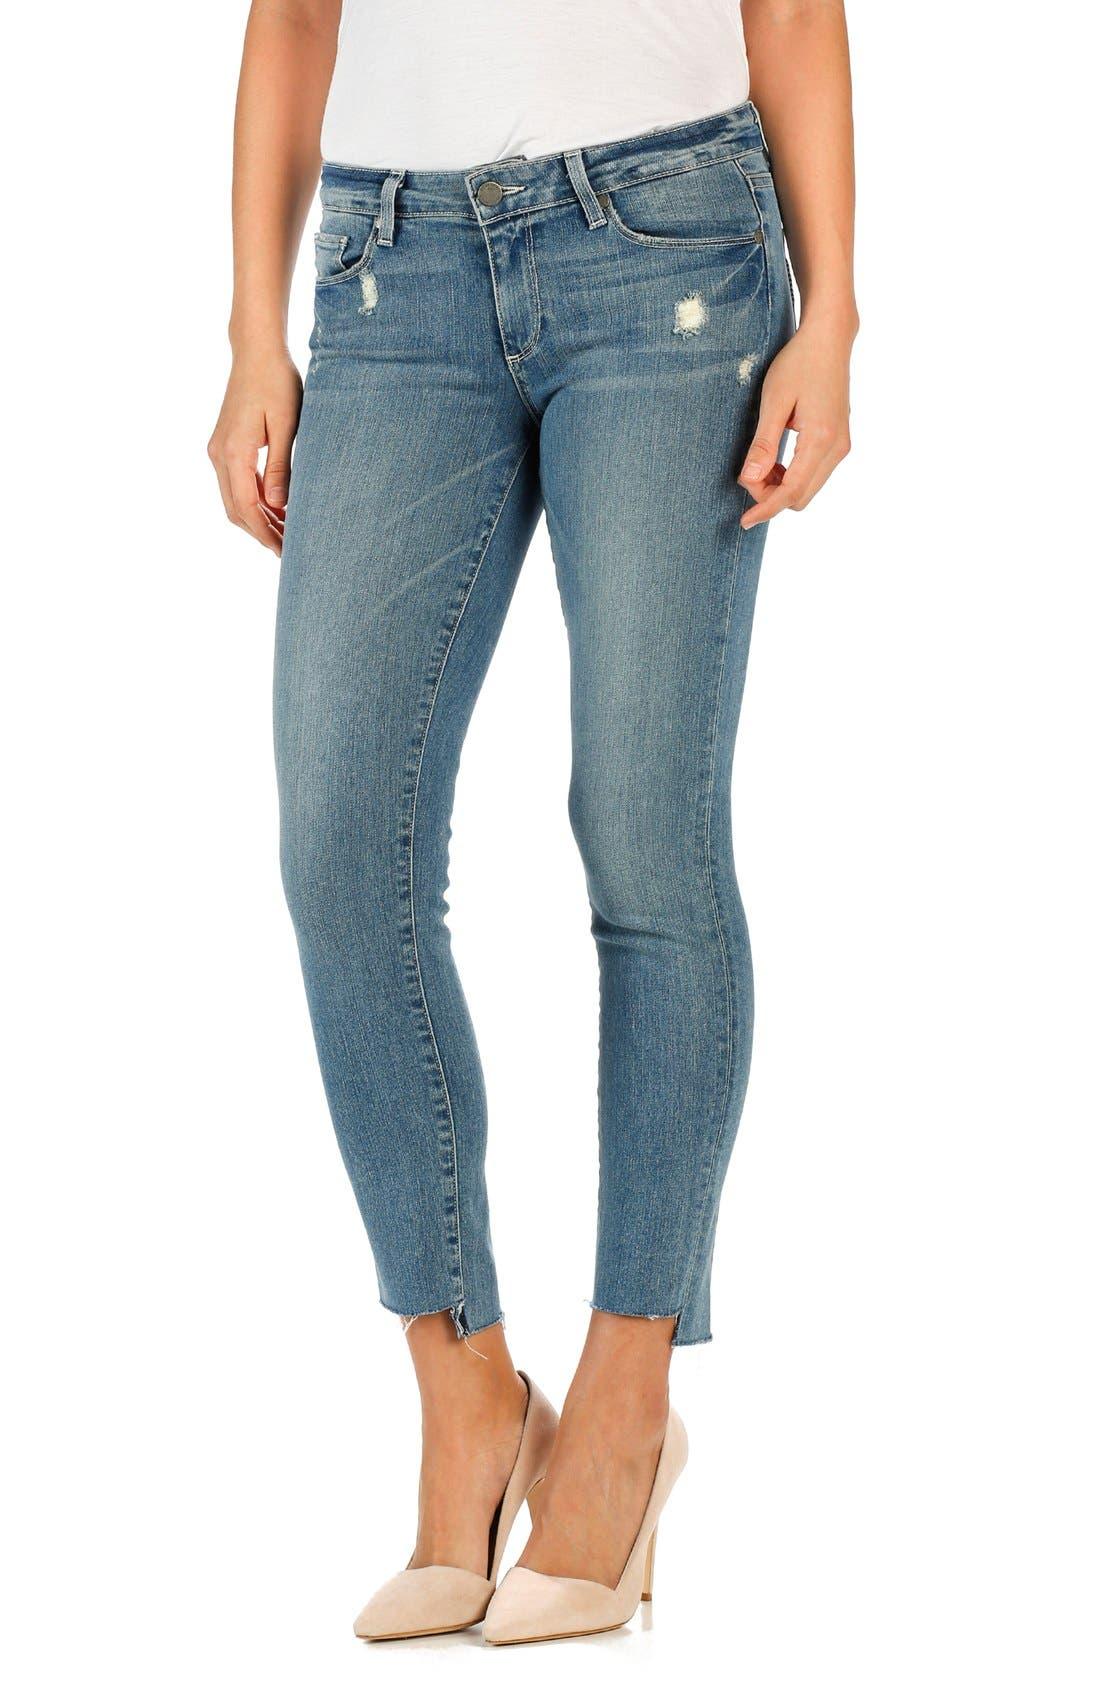 Alternate Image 1 Selected - PAIGE 'Skyline' Cutoff Ankle Peg Skinny Jeans (Wiley)